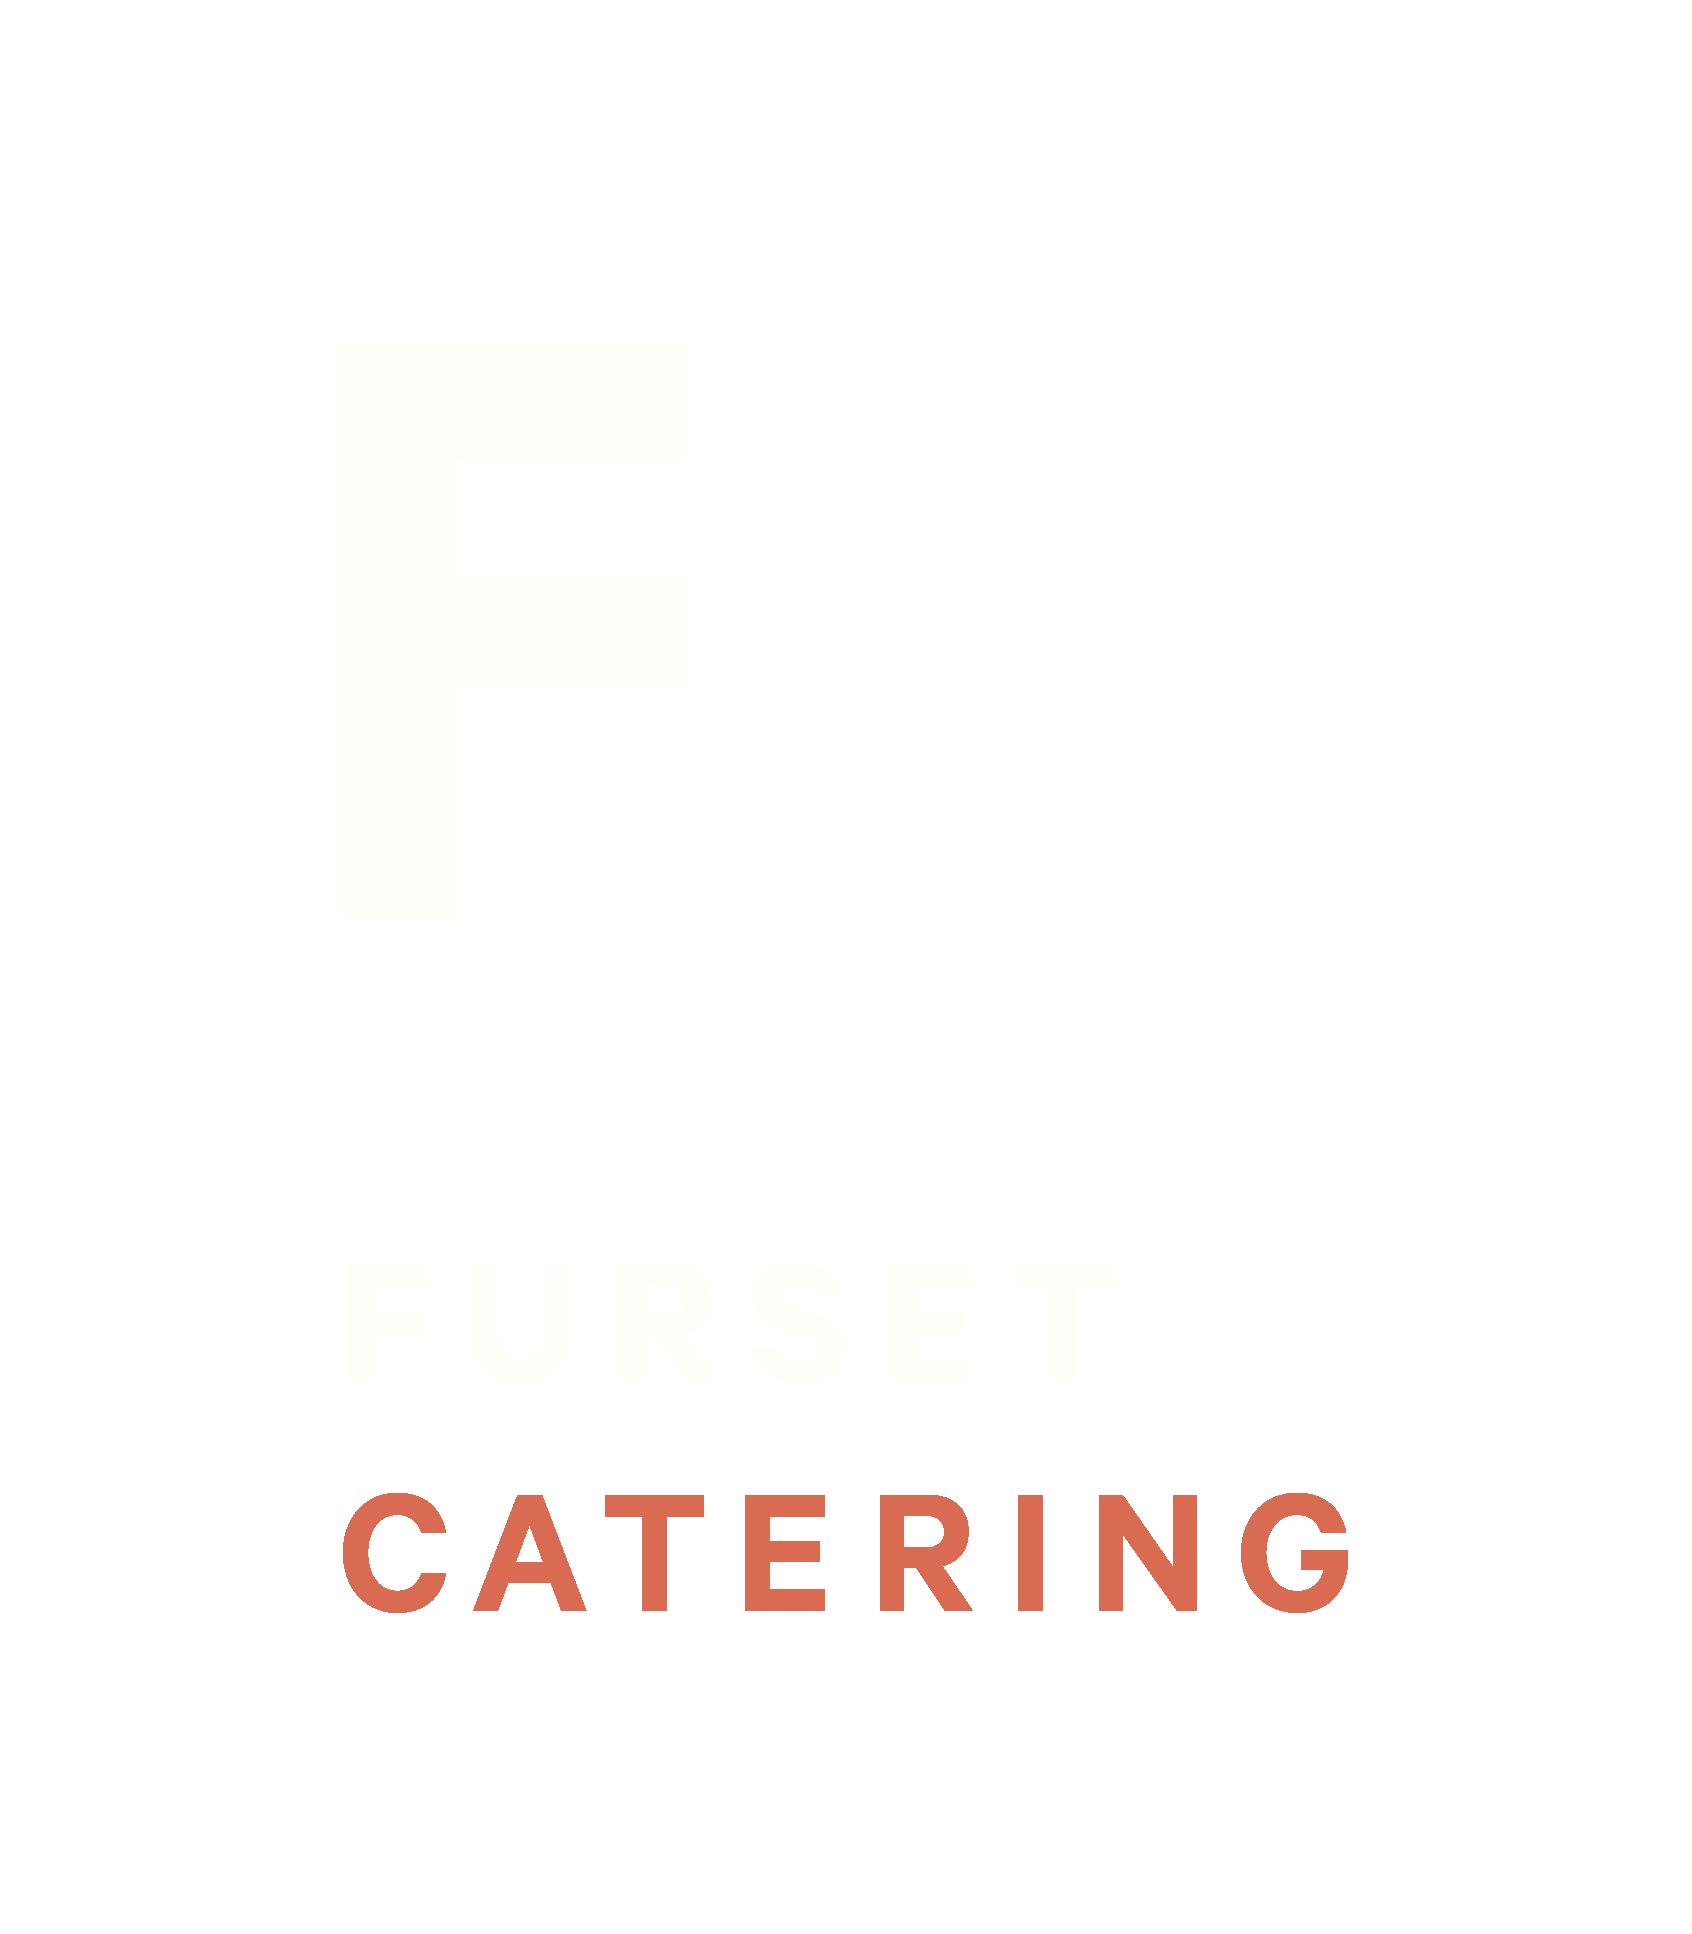 fg_catering_symbol_vertikal_rgb_negativ